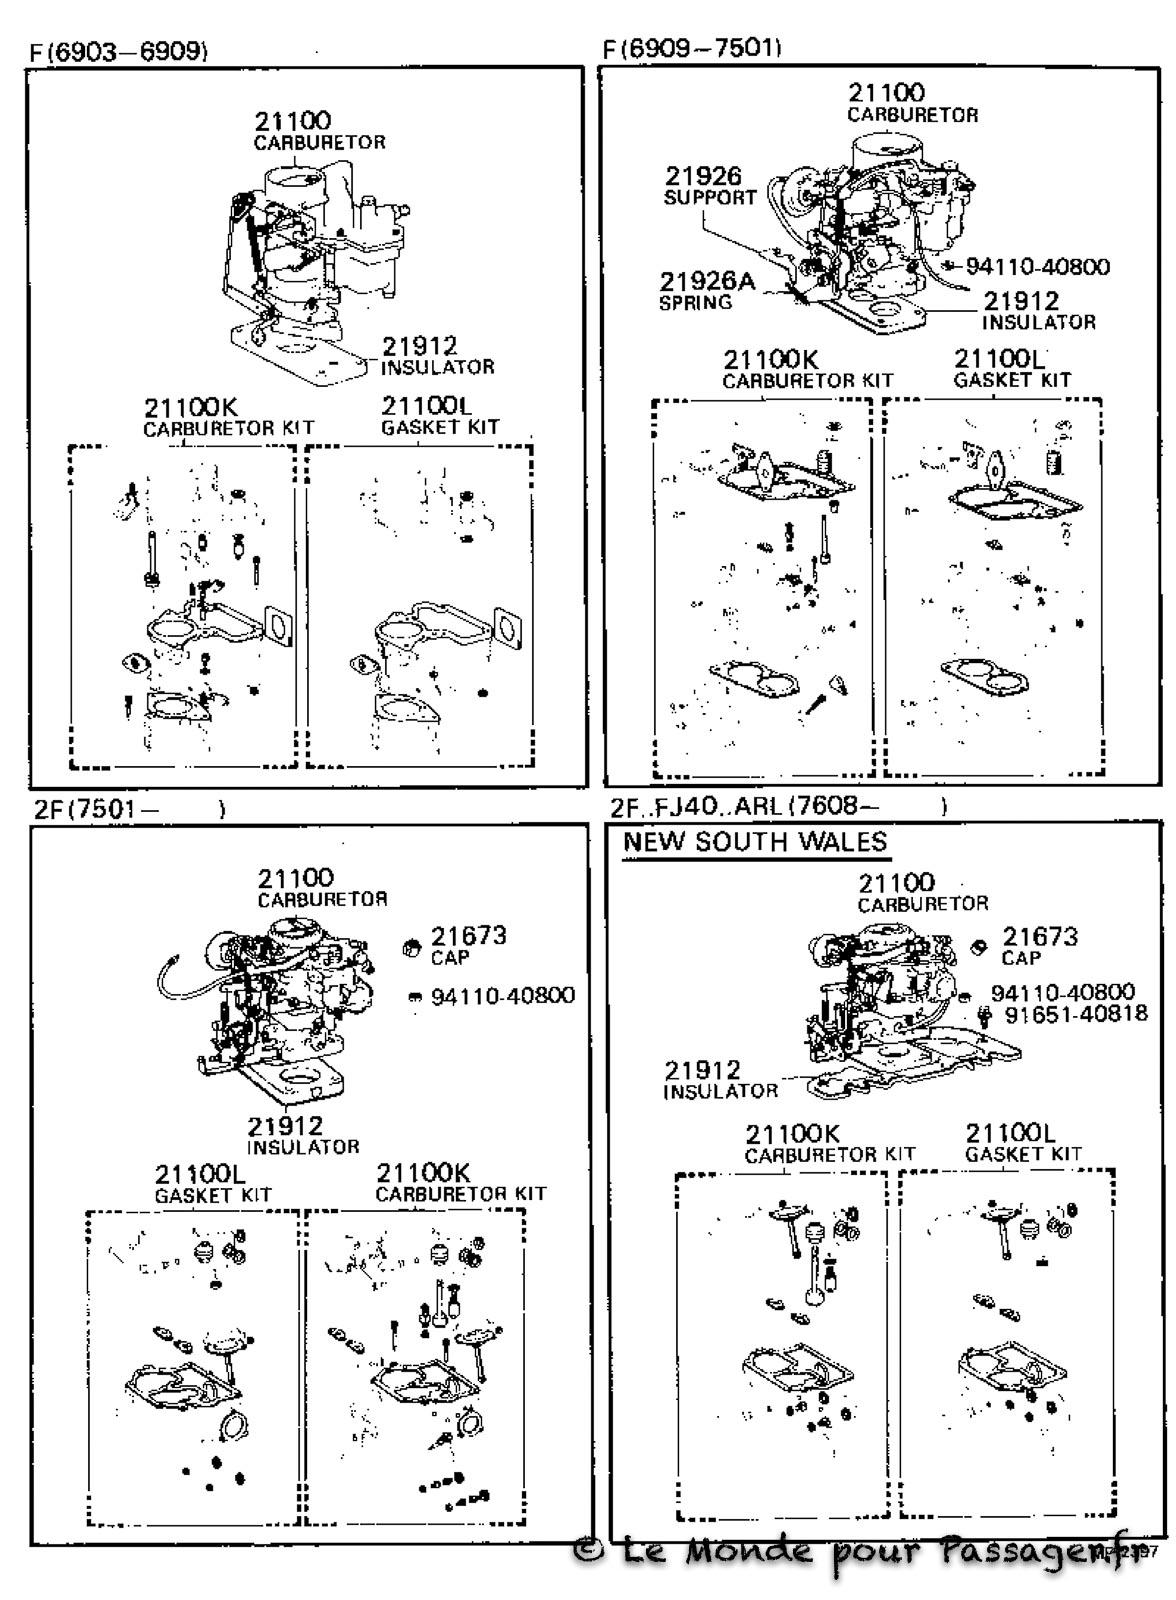 Fj55-Eclatés-Techniques061